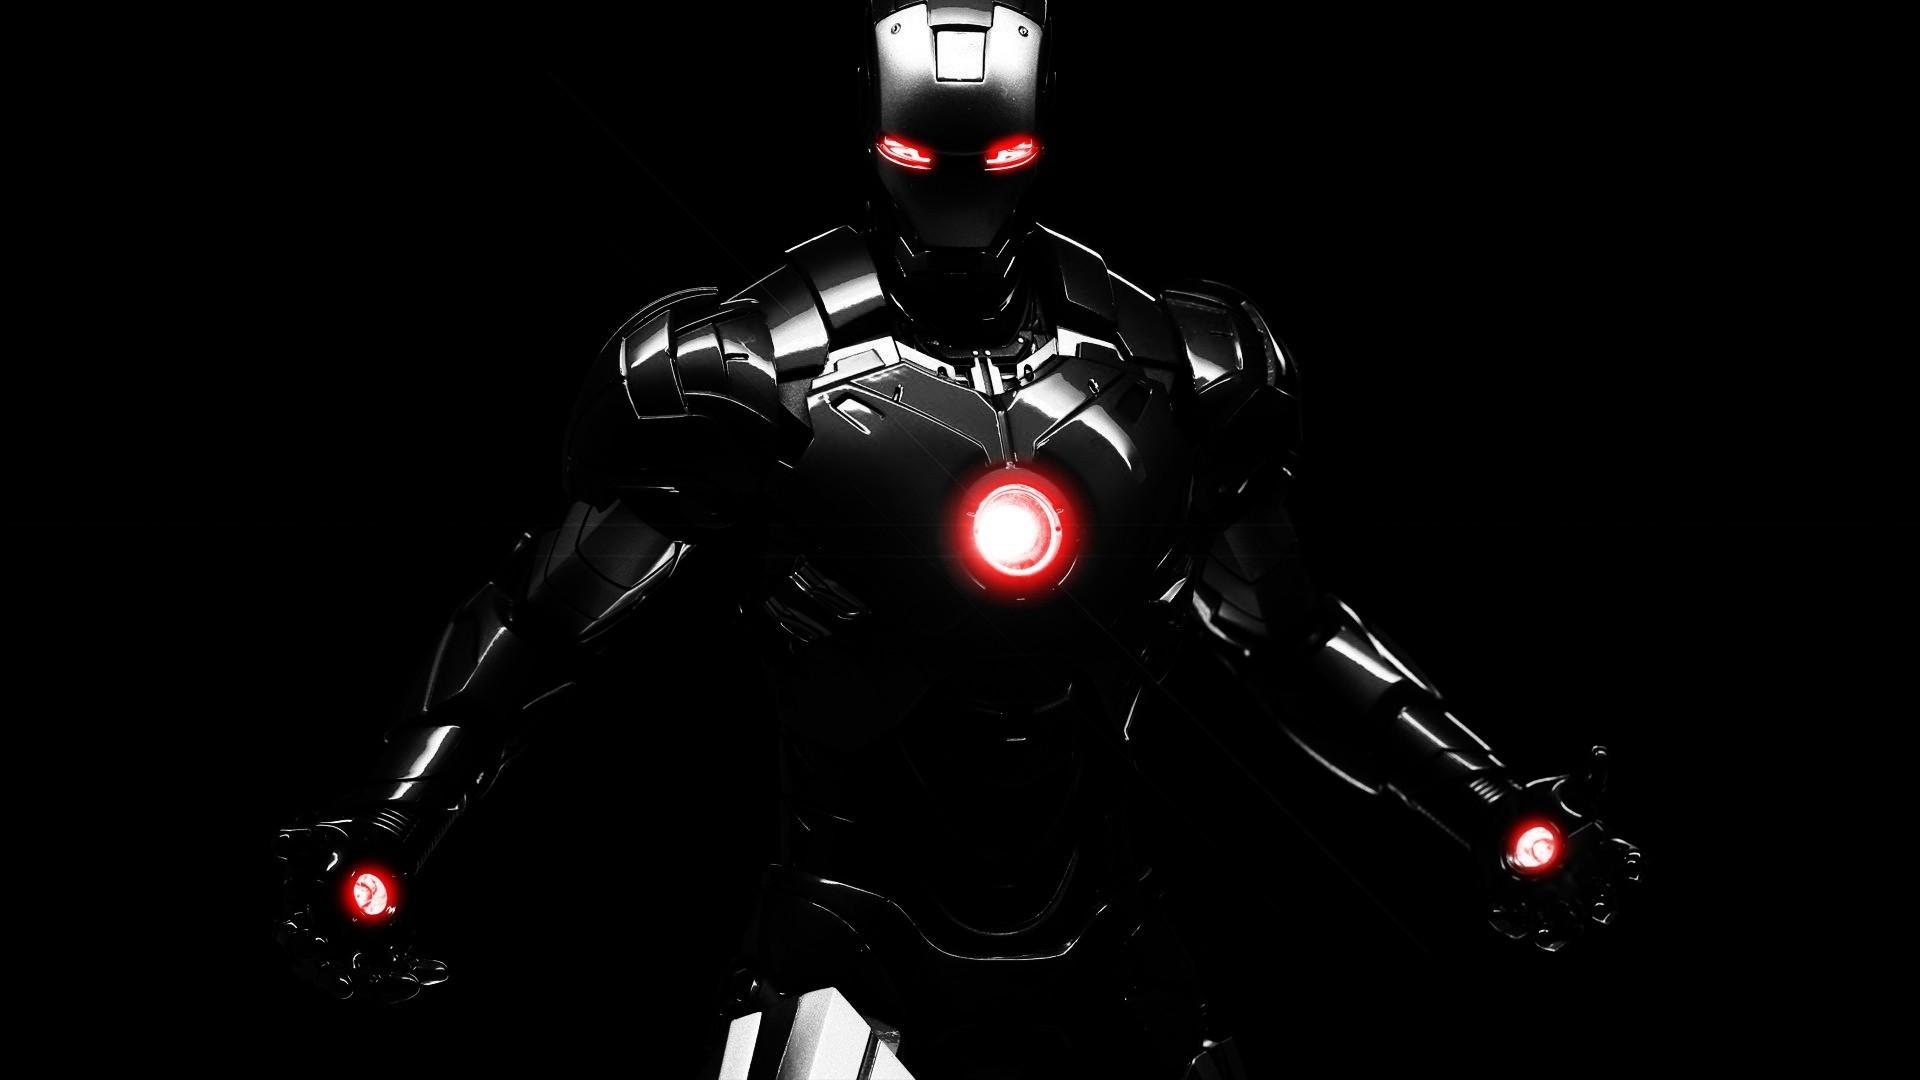 iron man 4 black hd wallpaper